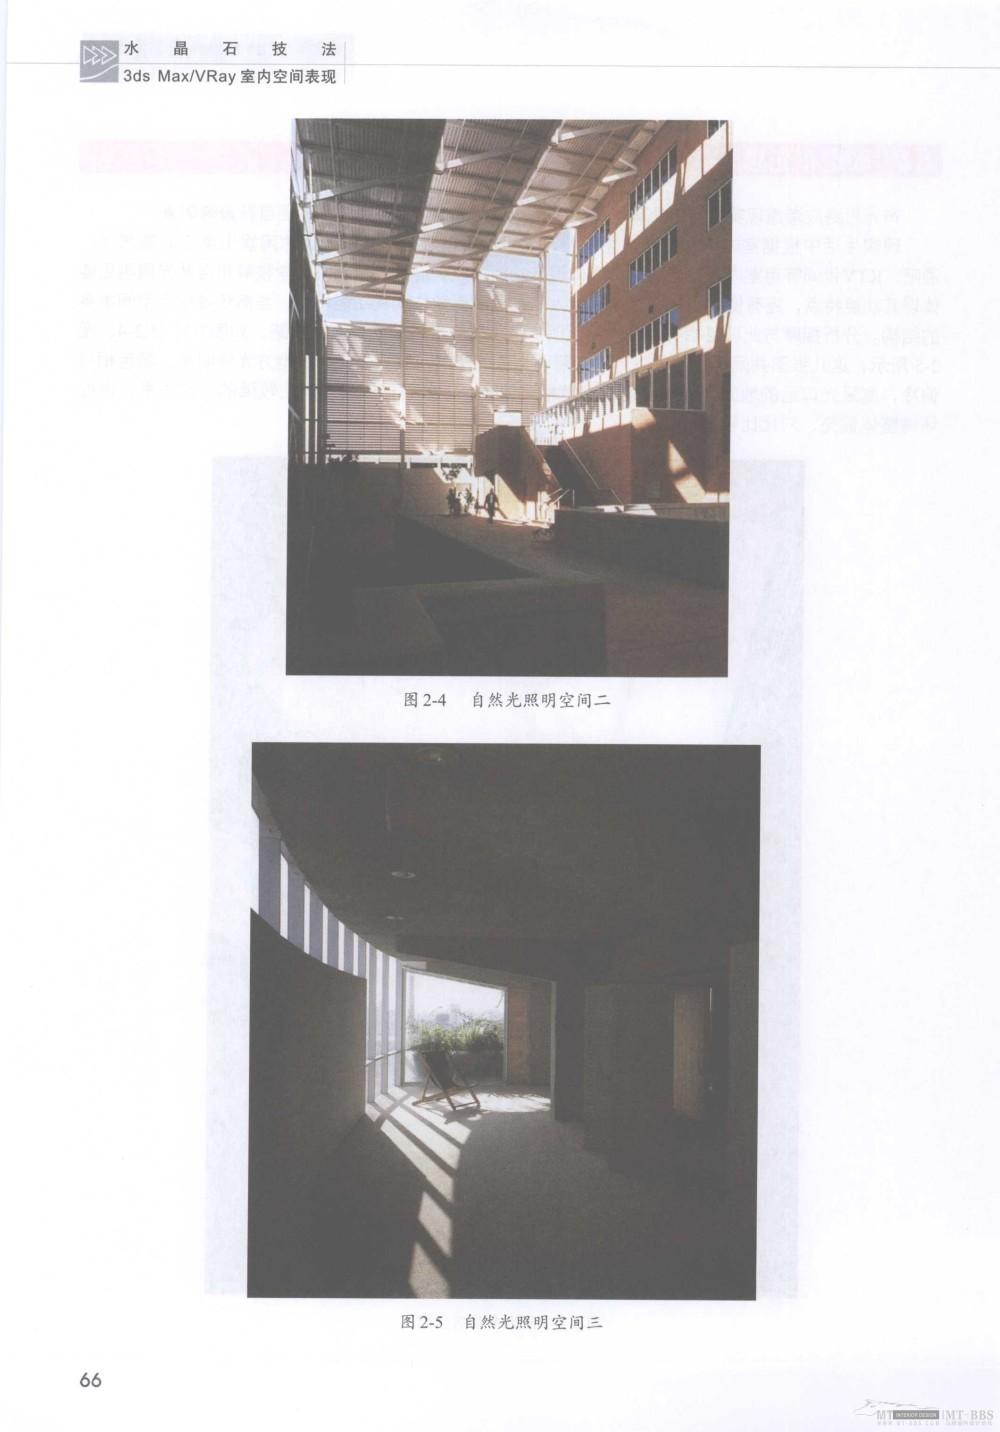 水晶石技法-3ds_Max&VRay室内空间表现_水晶石技法-3ds_Max&VRay室内空间表现_页面_072.jpg